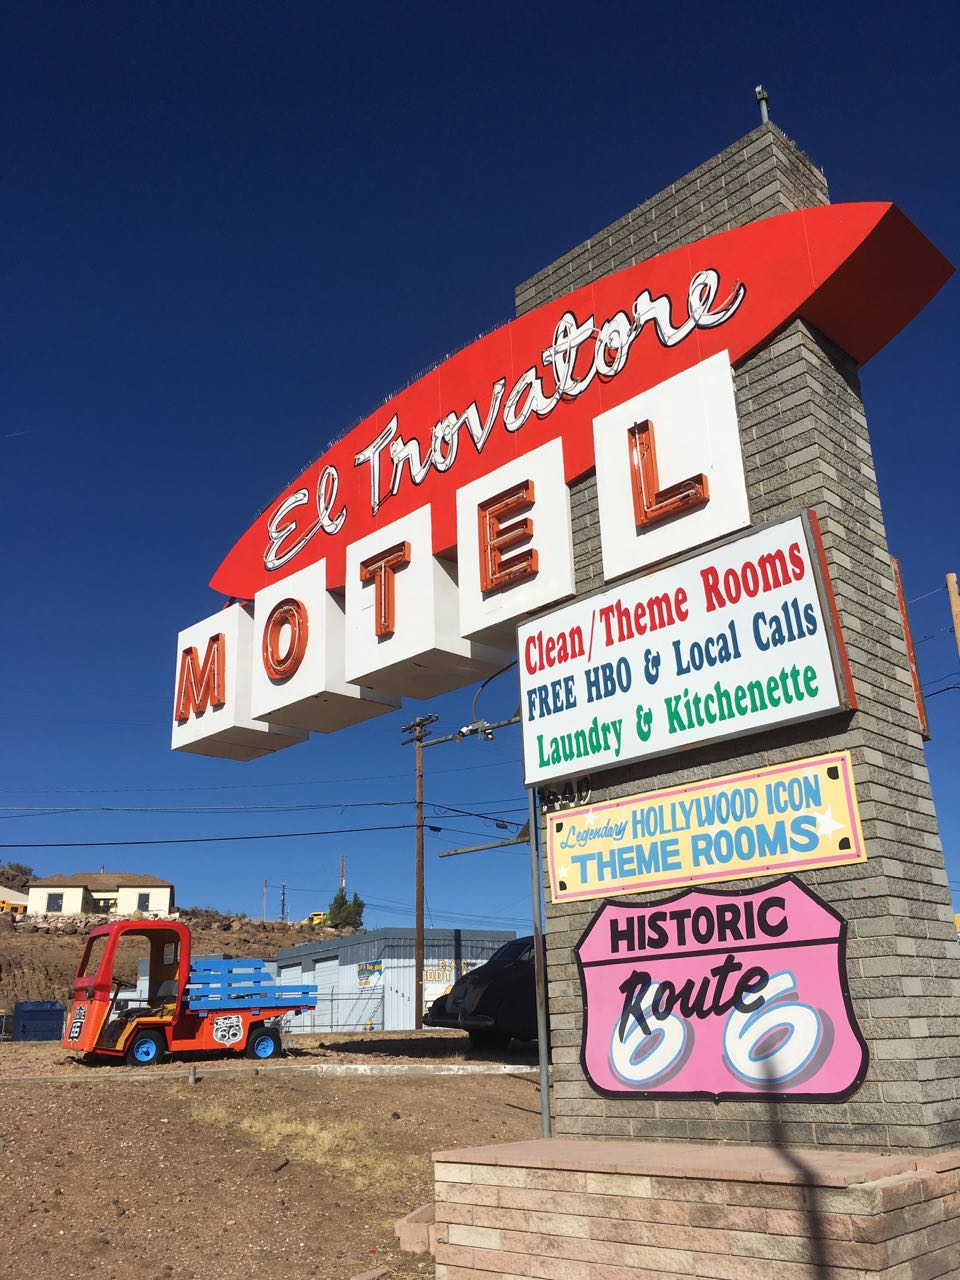 A classic Route 66 motel